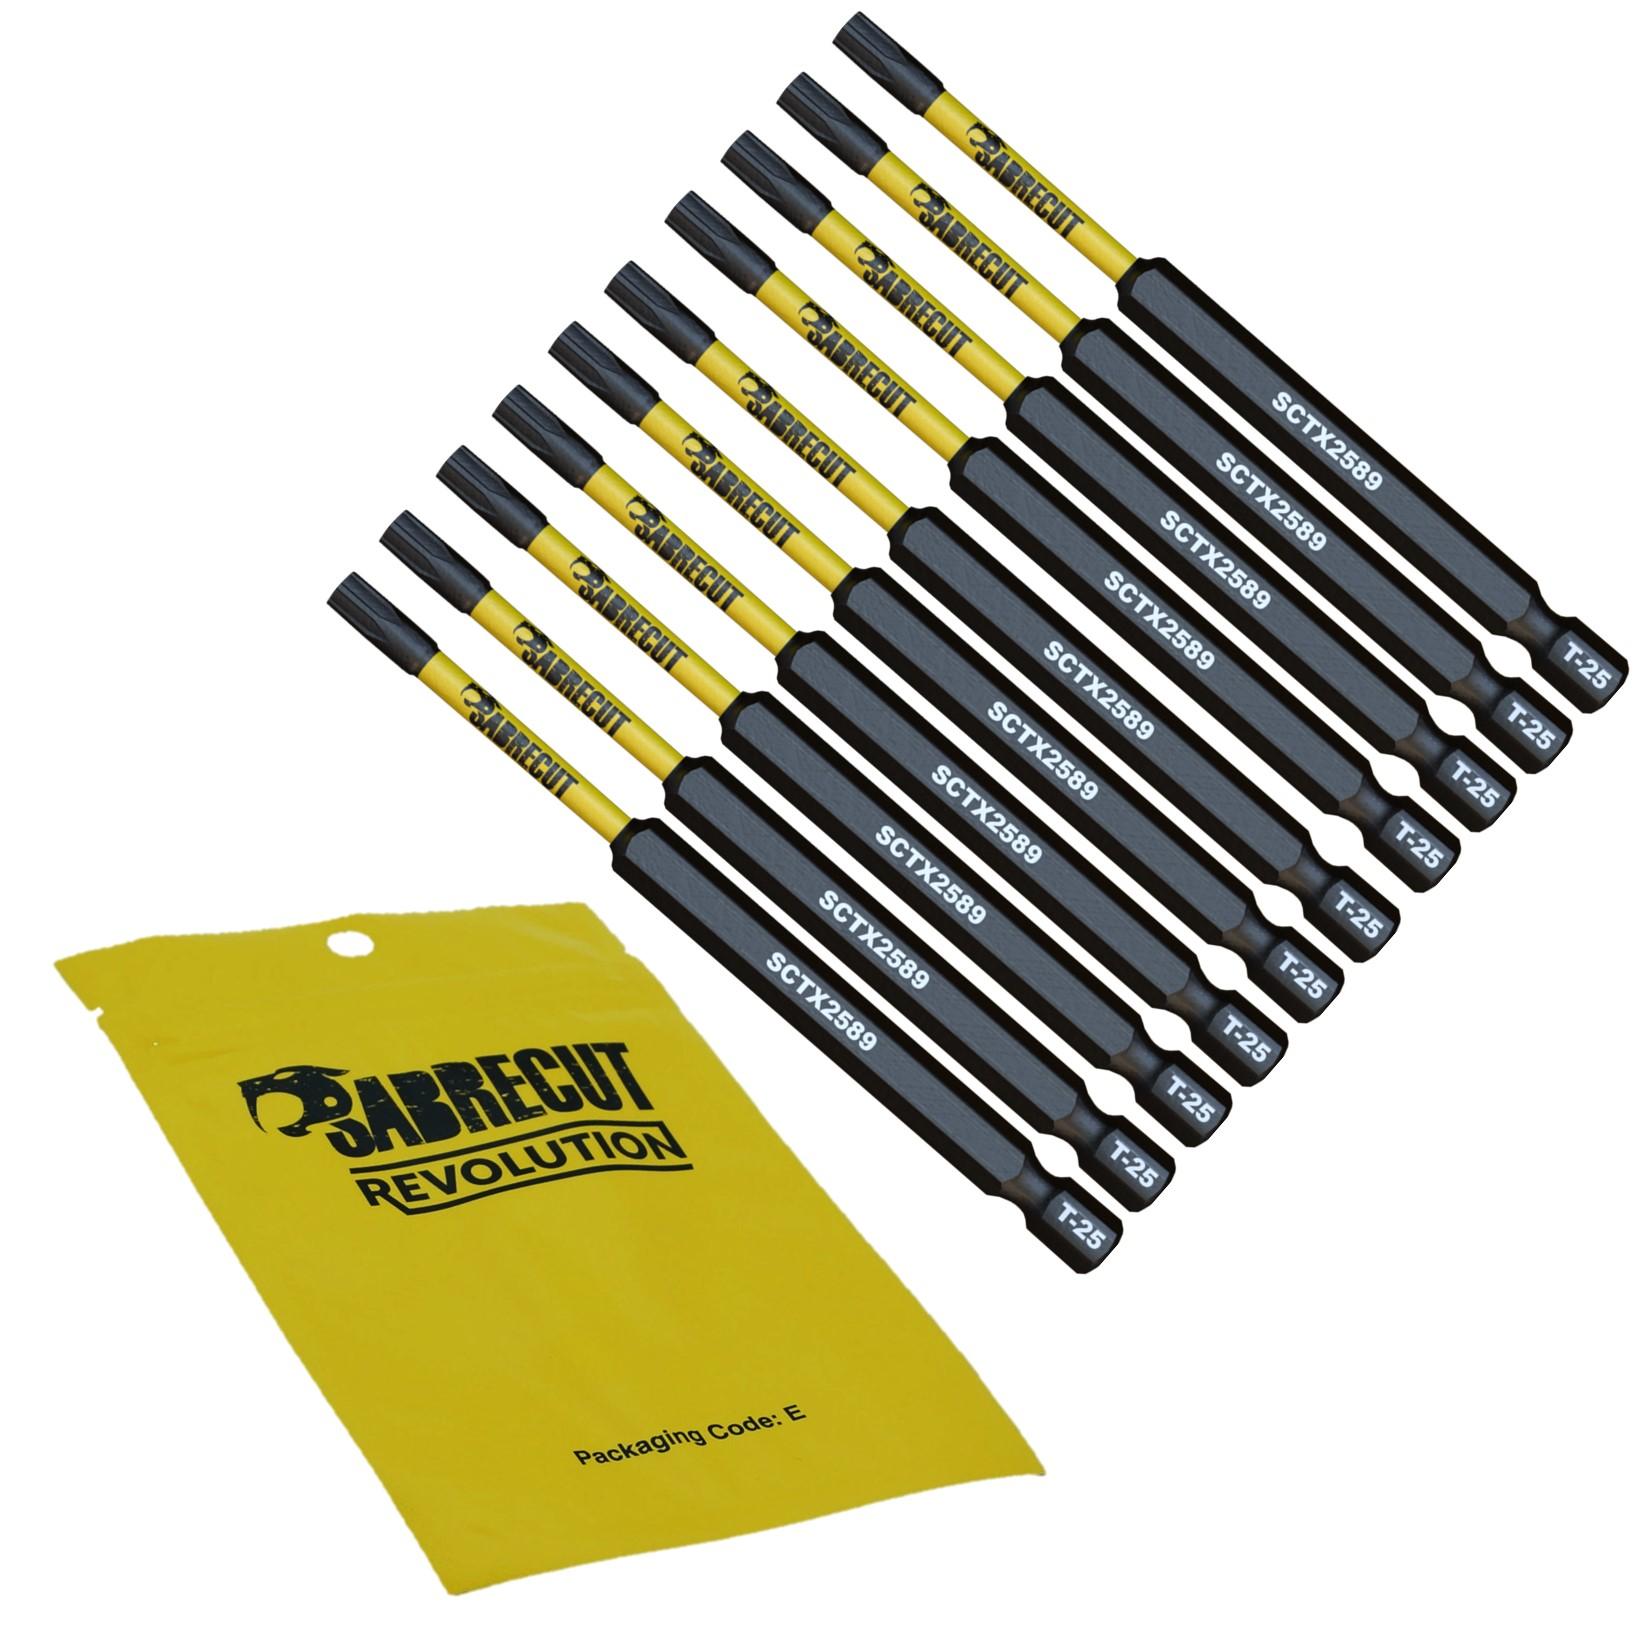 SabreCut-Mixed-Impact-Screwdriver-Bits-89mm-PZ2-PH2-Torx-Milwaukee-DeWalt thumbnail 20